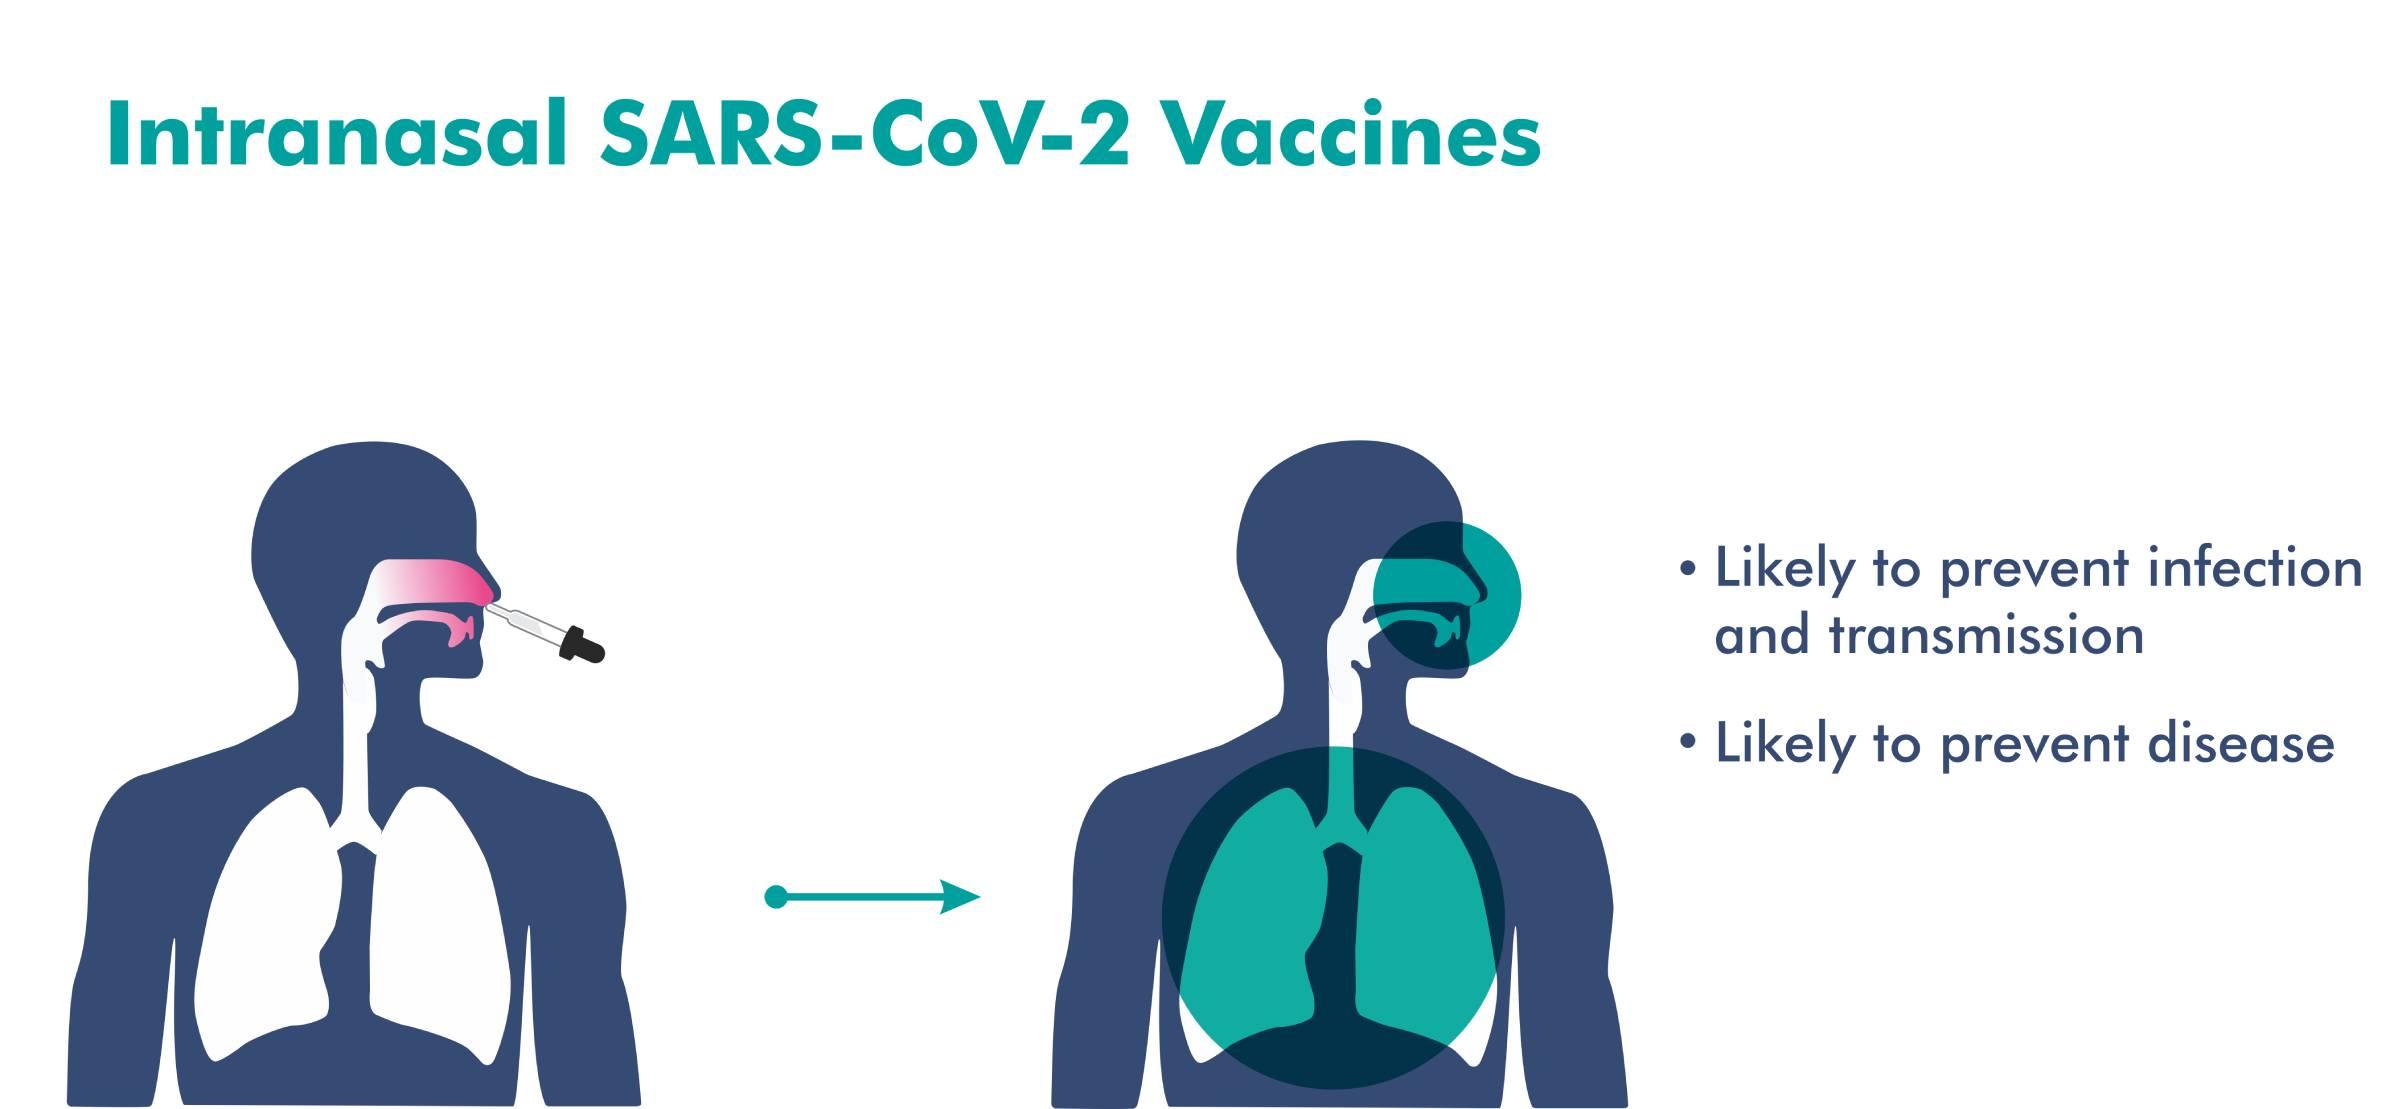 https://www.bharatbiotech.com/images/intransal-covid-vaccine.jpg